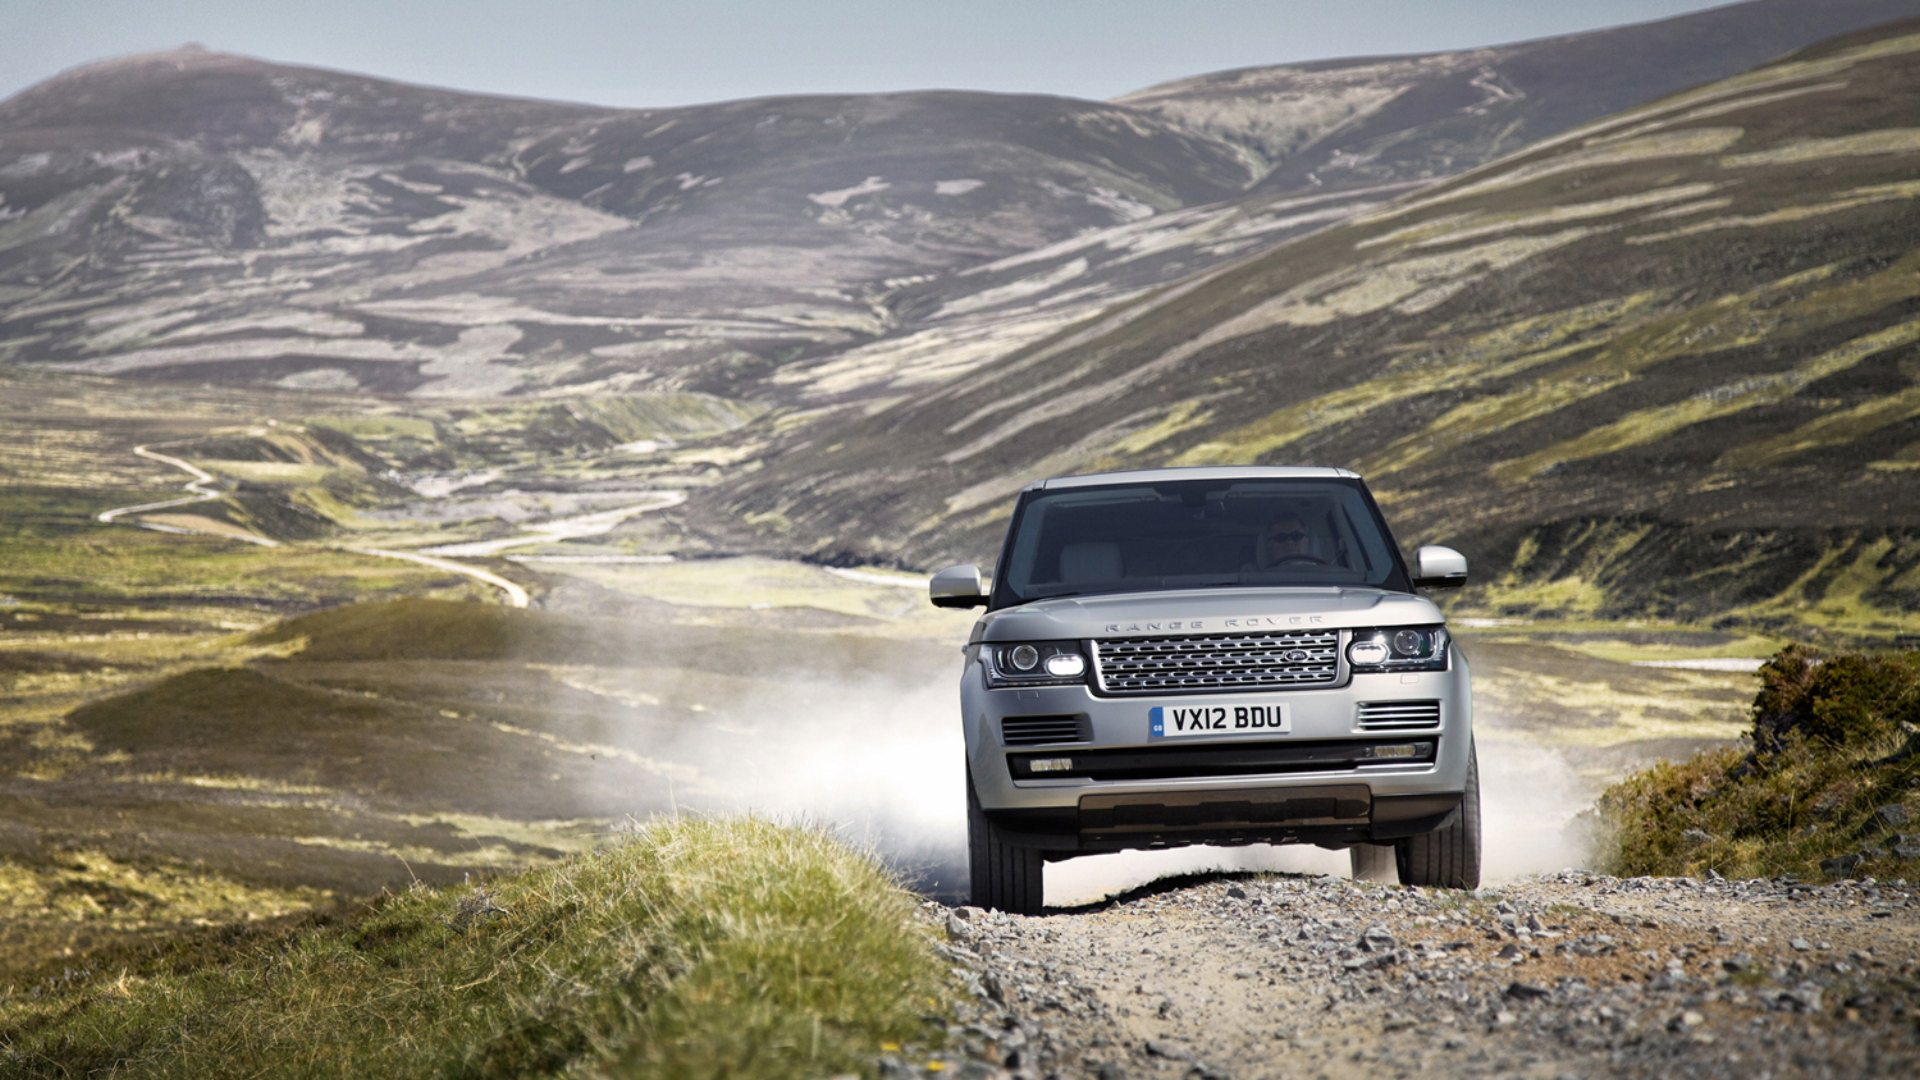 Range Rover Wallpaper Hd: Wallpaper: 2013 Land Rover Range Rover Wallpapers